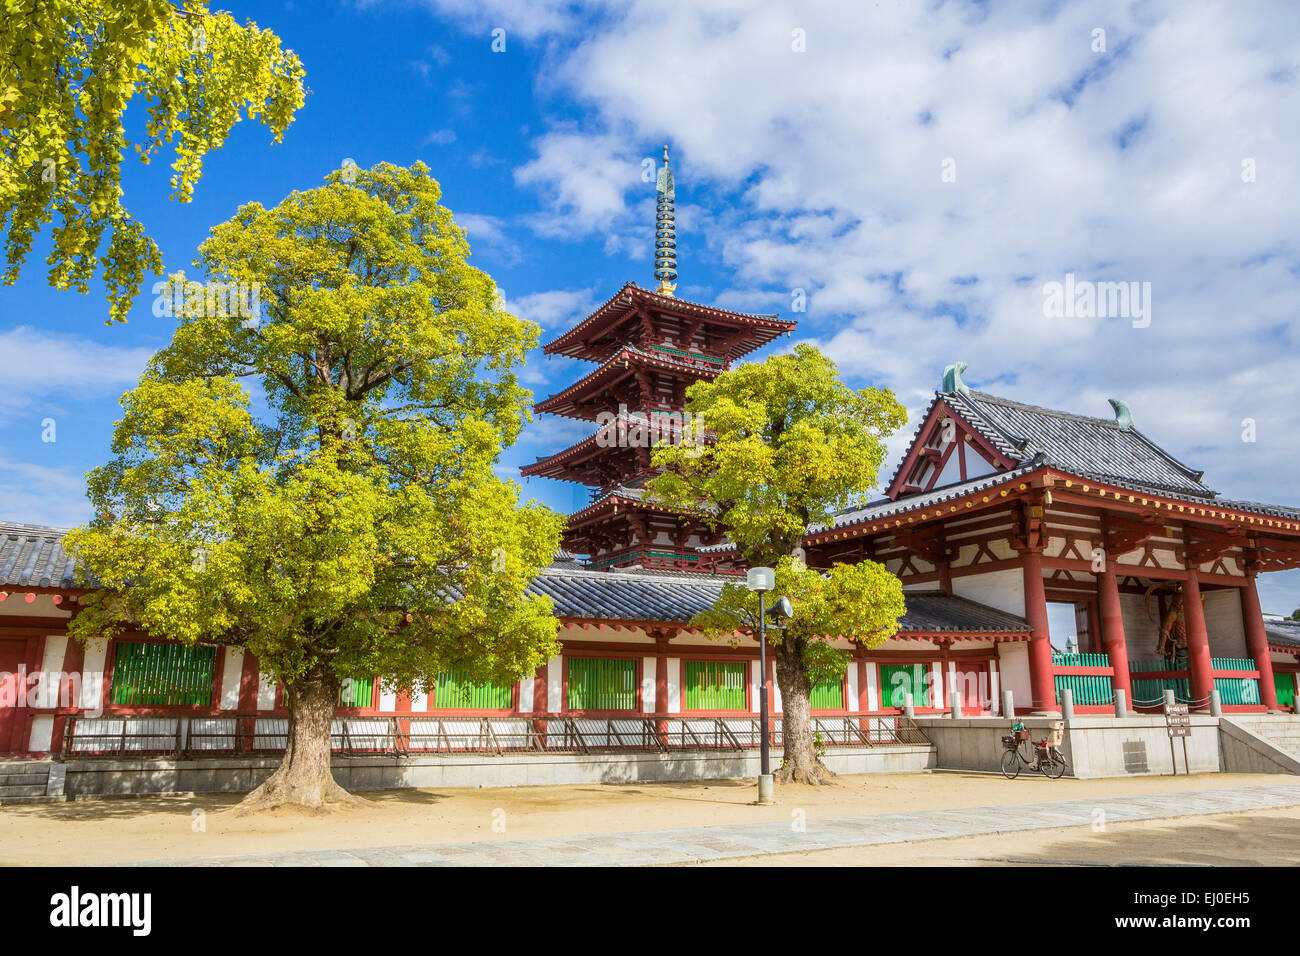 Japan, Asia, Kansai, Osaka, City, Shitennoji, Temple, world heritage, architecture, history, morning, pagoda, religion, - Stock Image